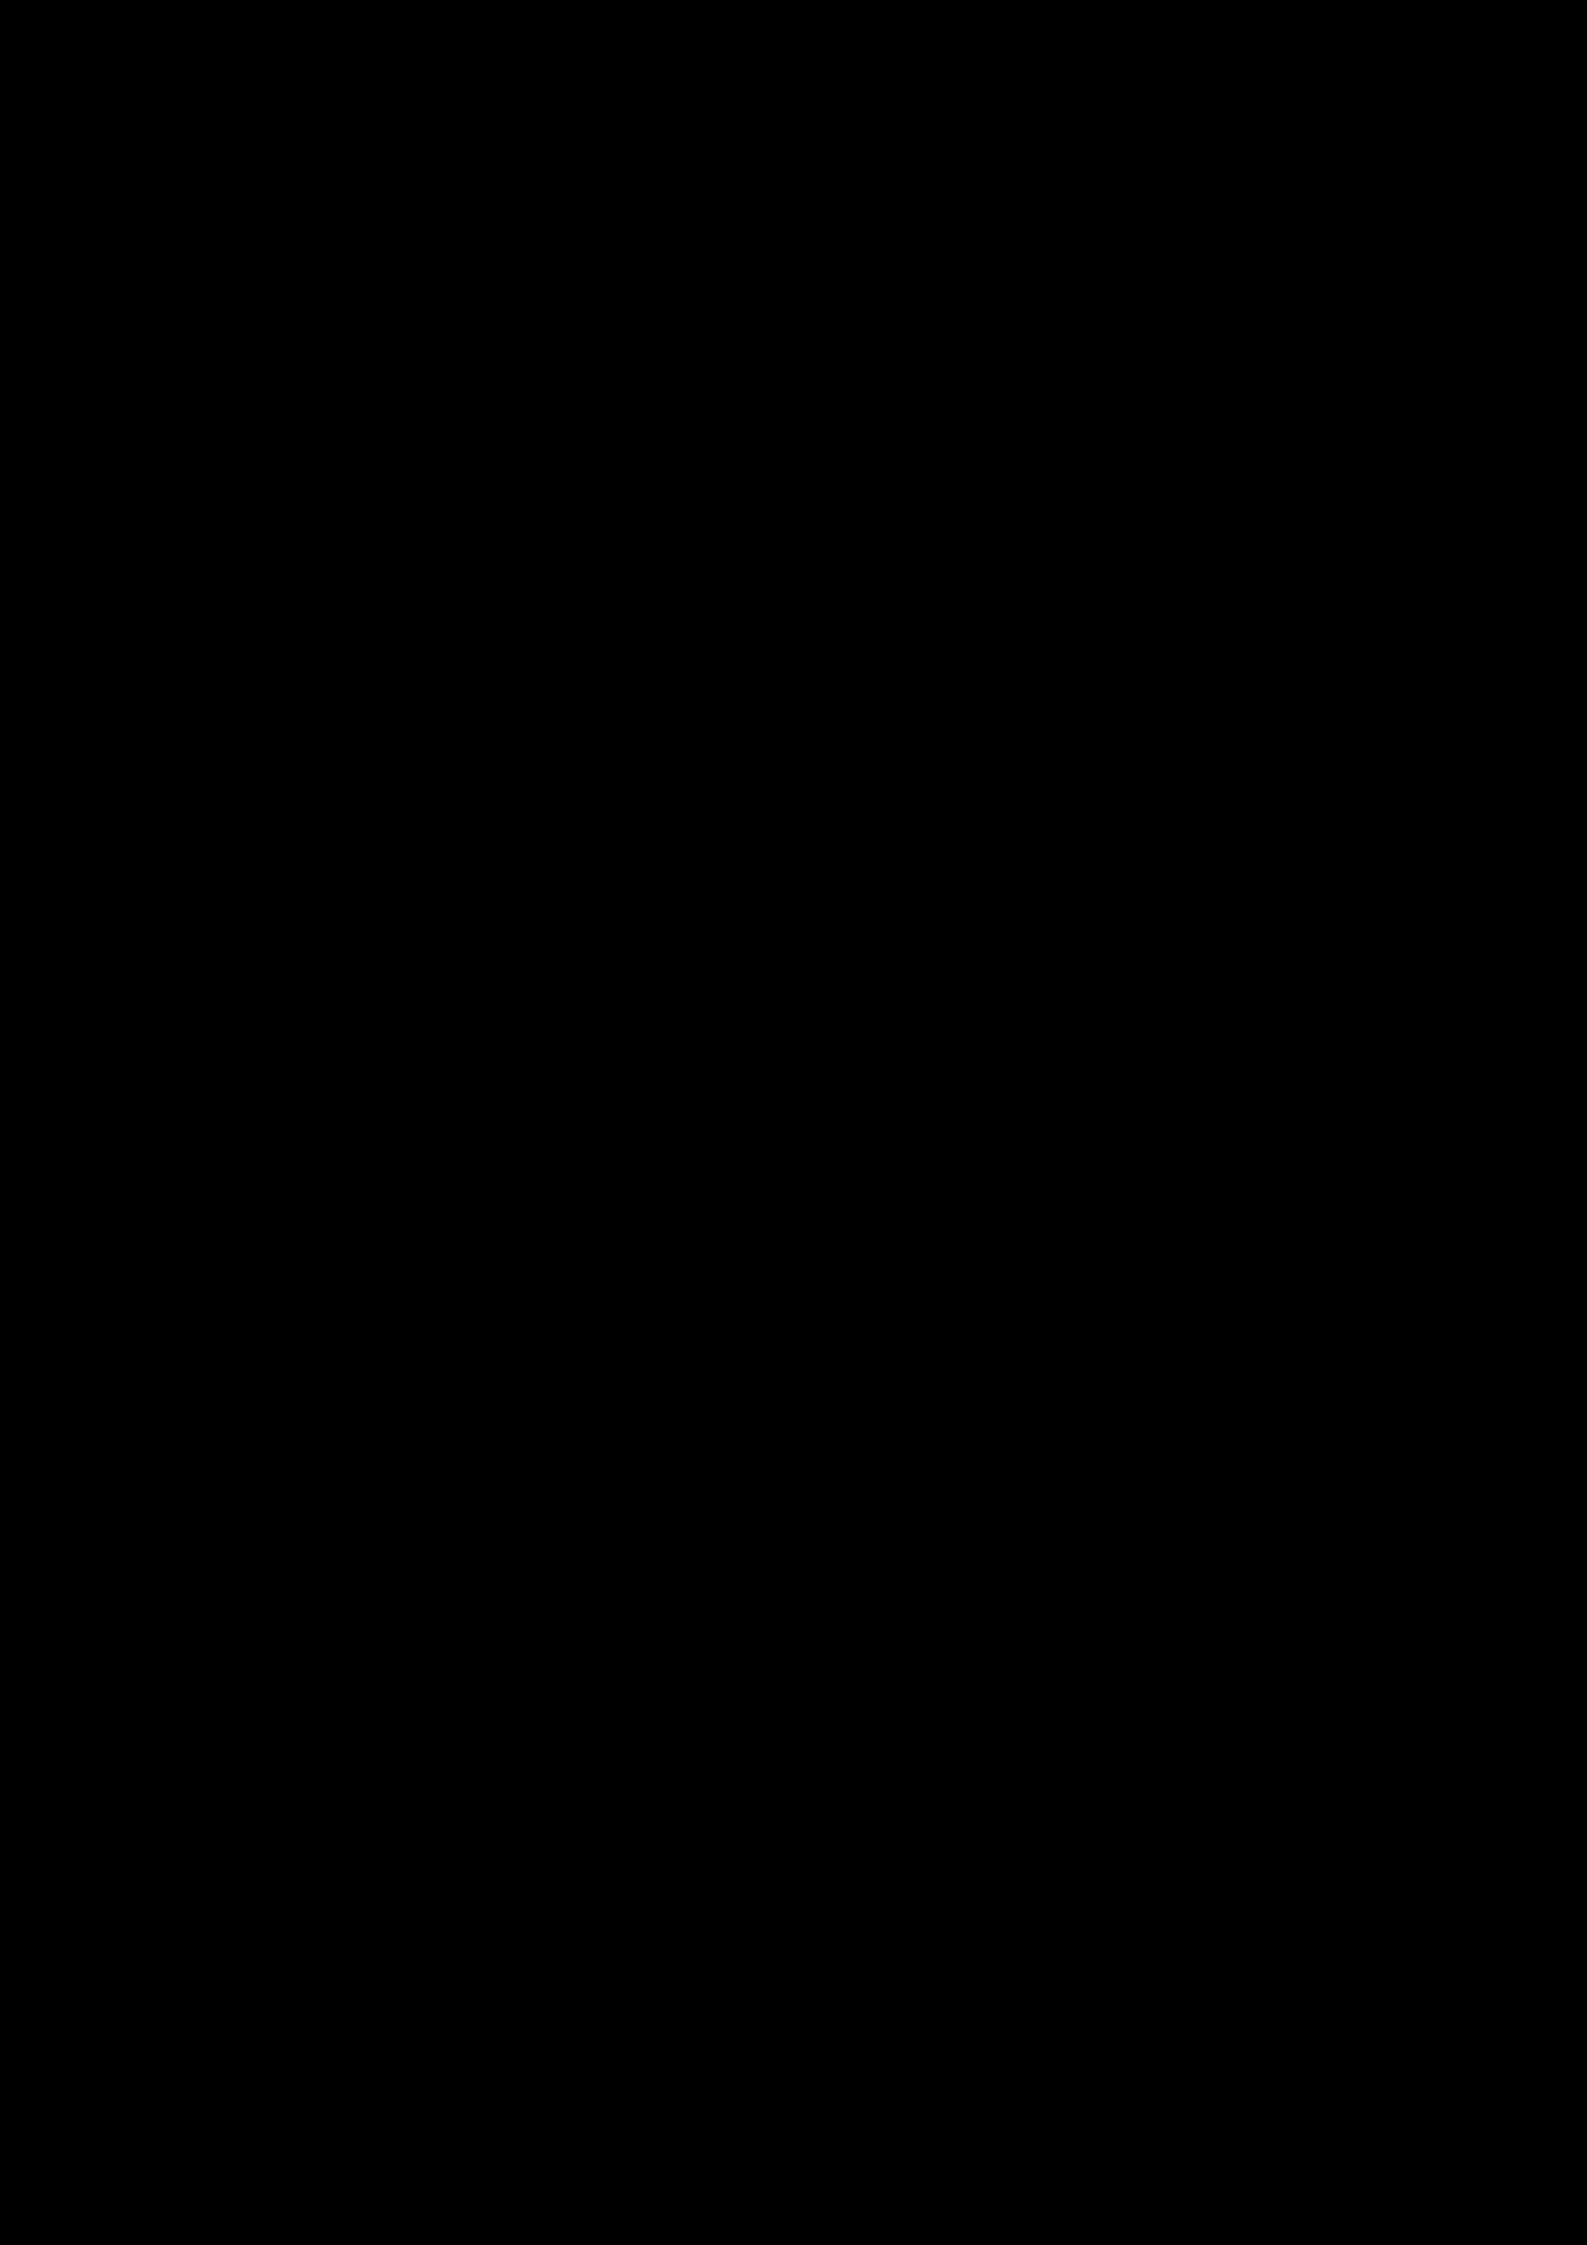 Mascarilla FFP2 NR Color Negro 1und